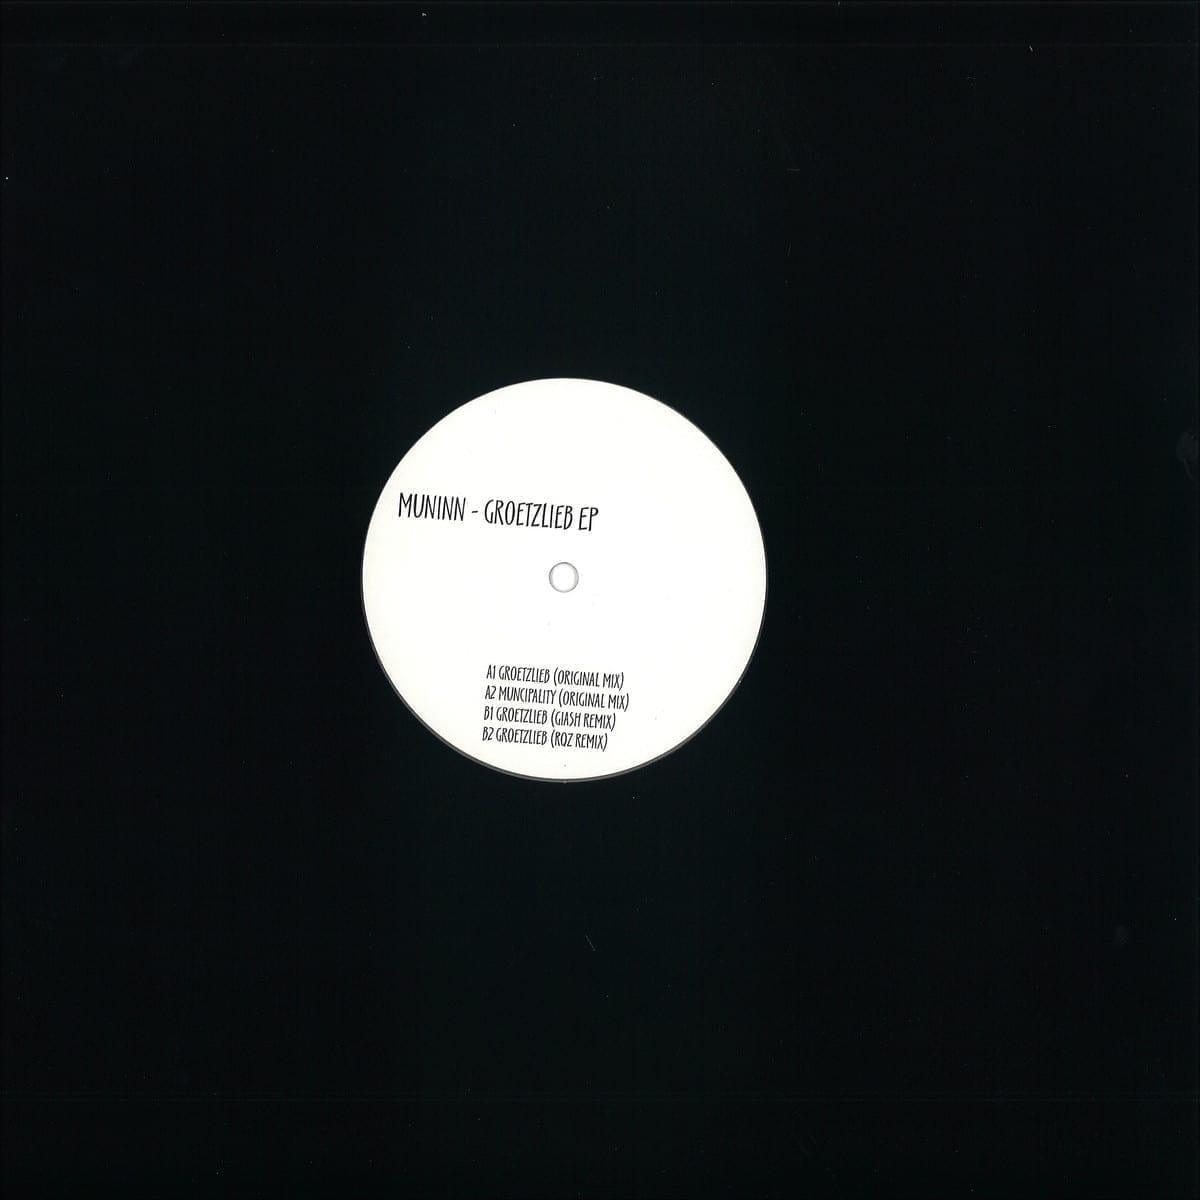 Muninn - Groetzlieb EP [Sobriquet Records] back